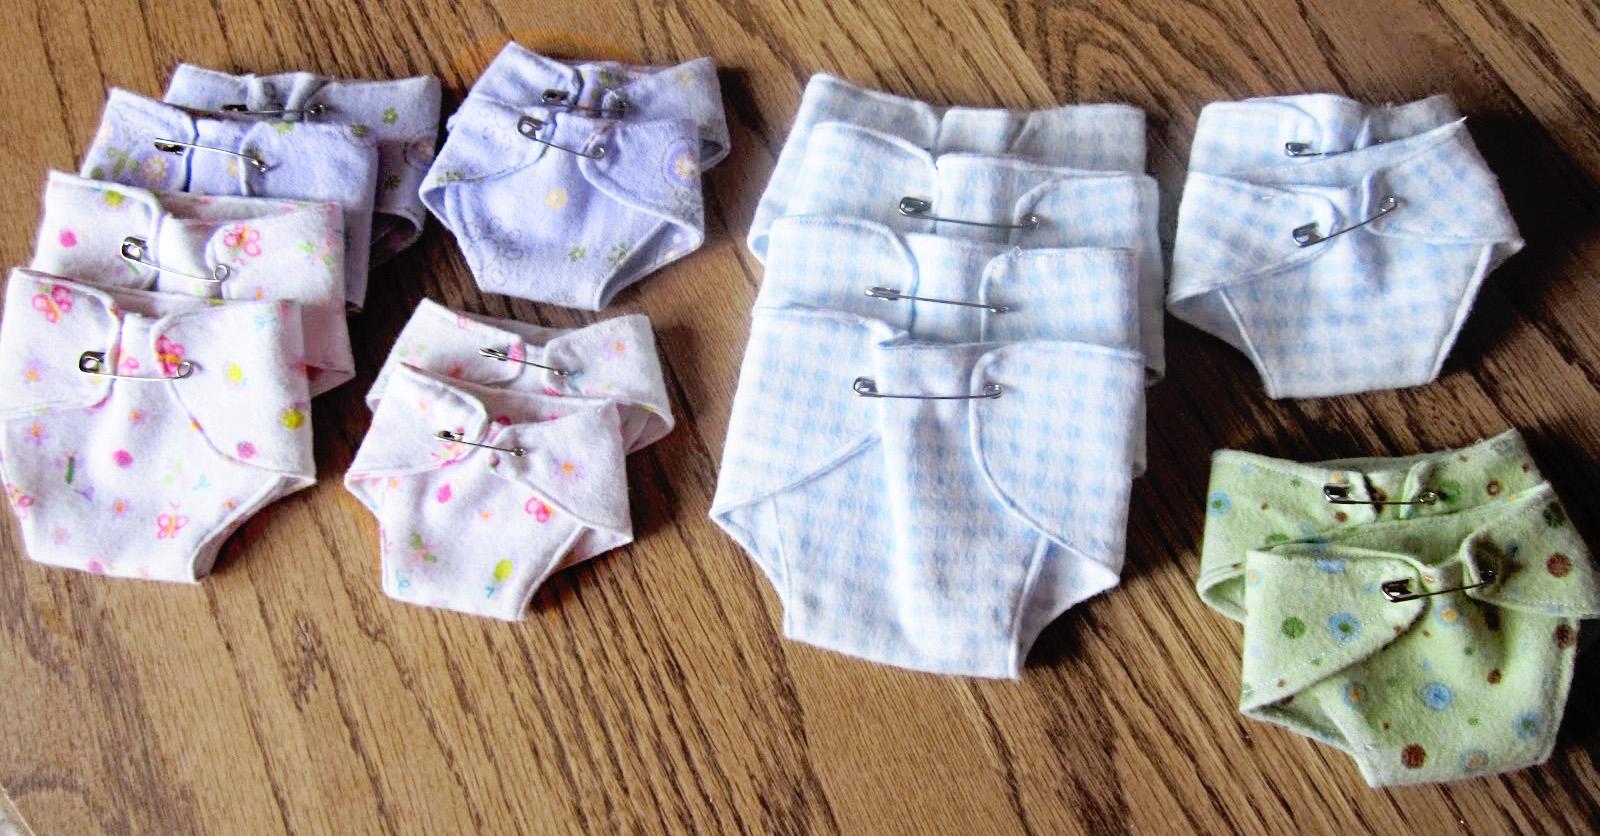 Emma's Diaper Pic4.jpg